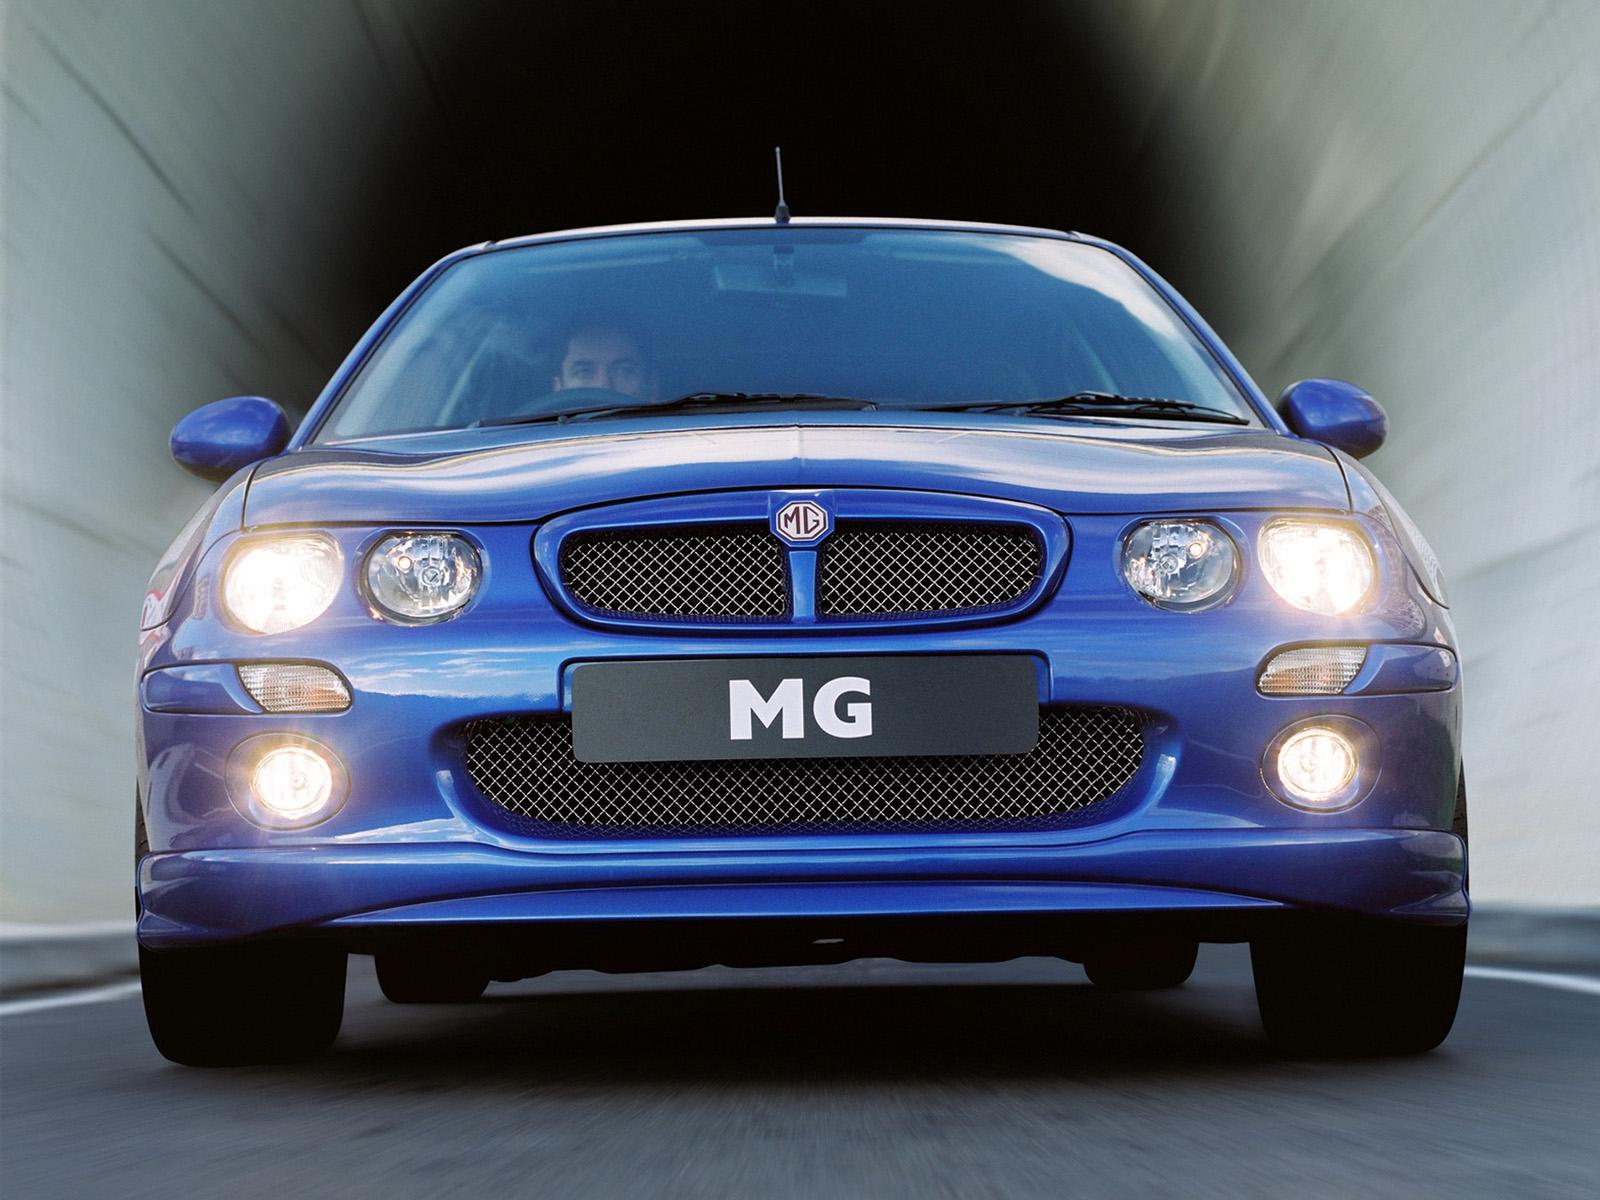 Exterior | New MG ZS | Our SUV Range | Models | MG Motor UK